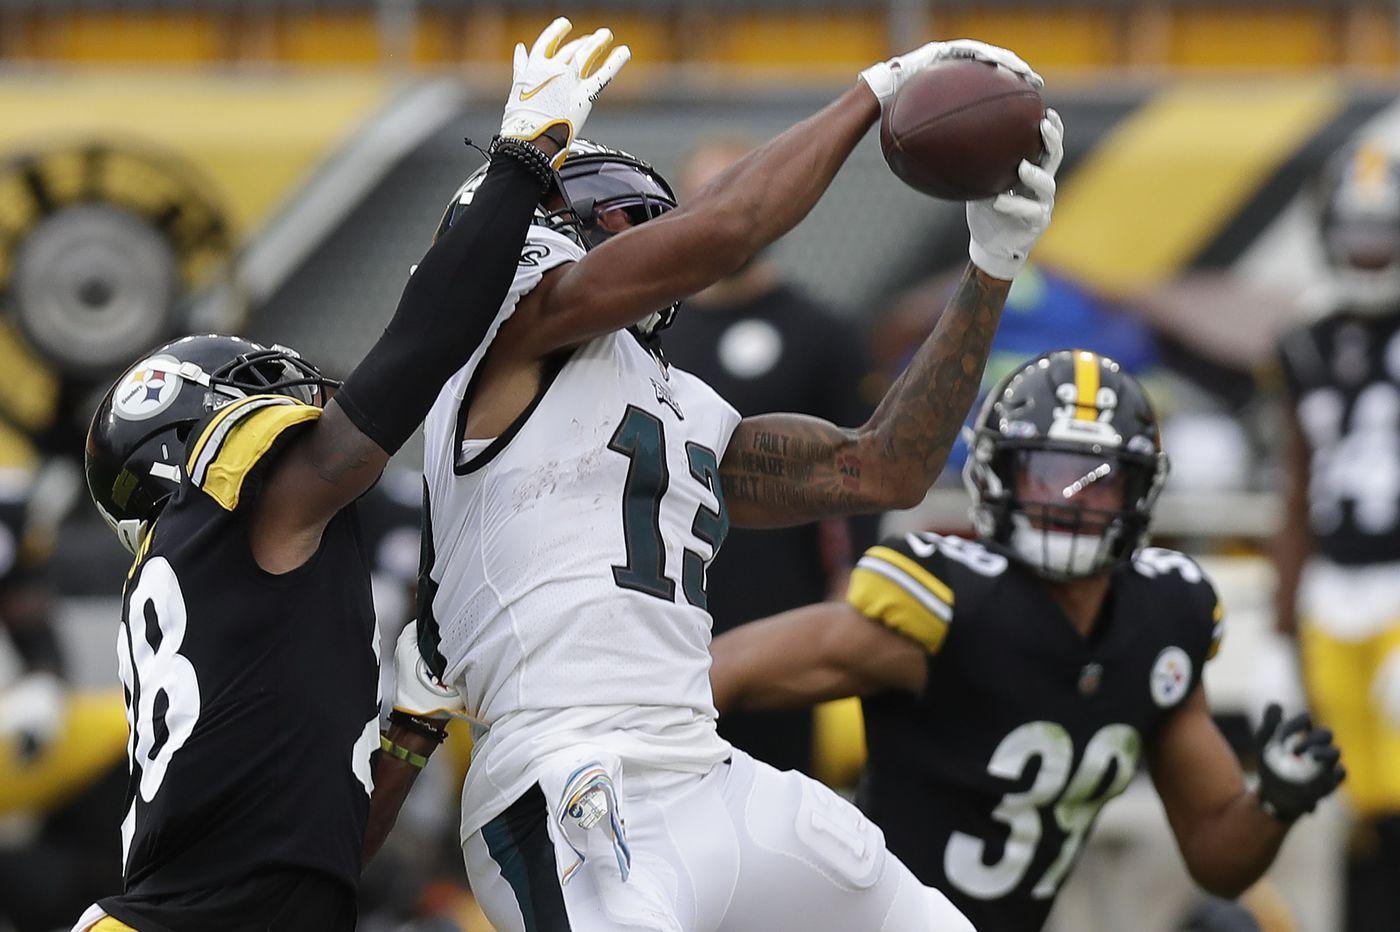 Travis Fulgham, Carson Wentz connect as one of Philadelphia Eagles' few bright spots in Week 5